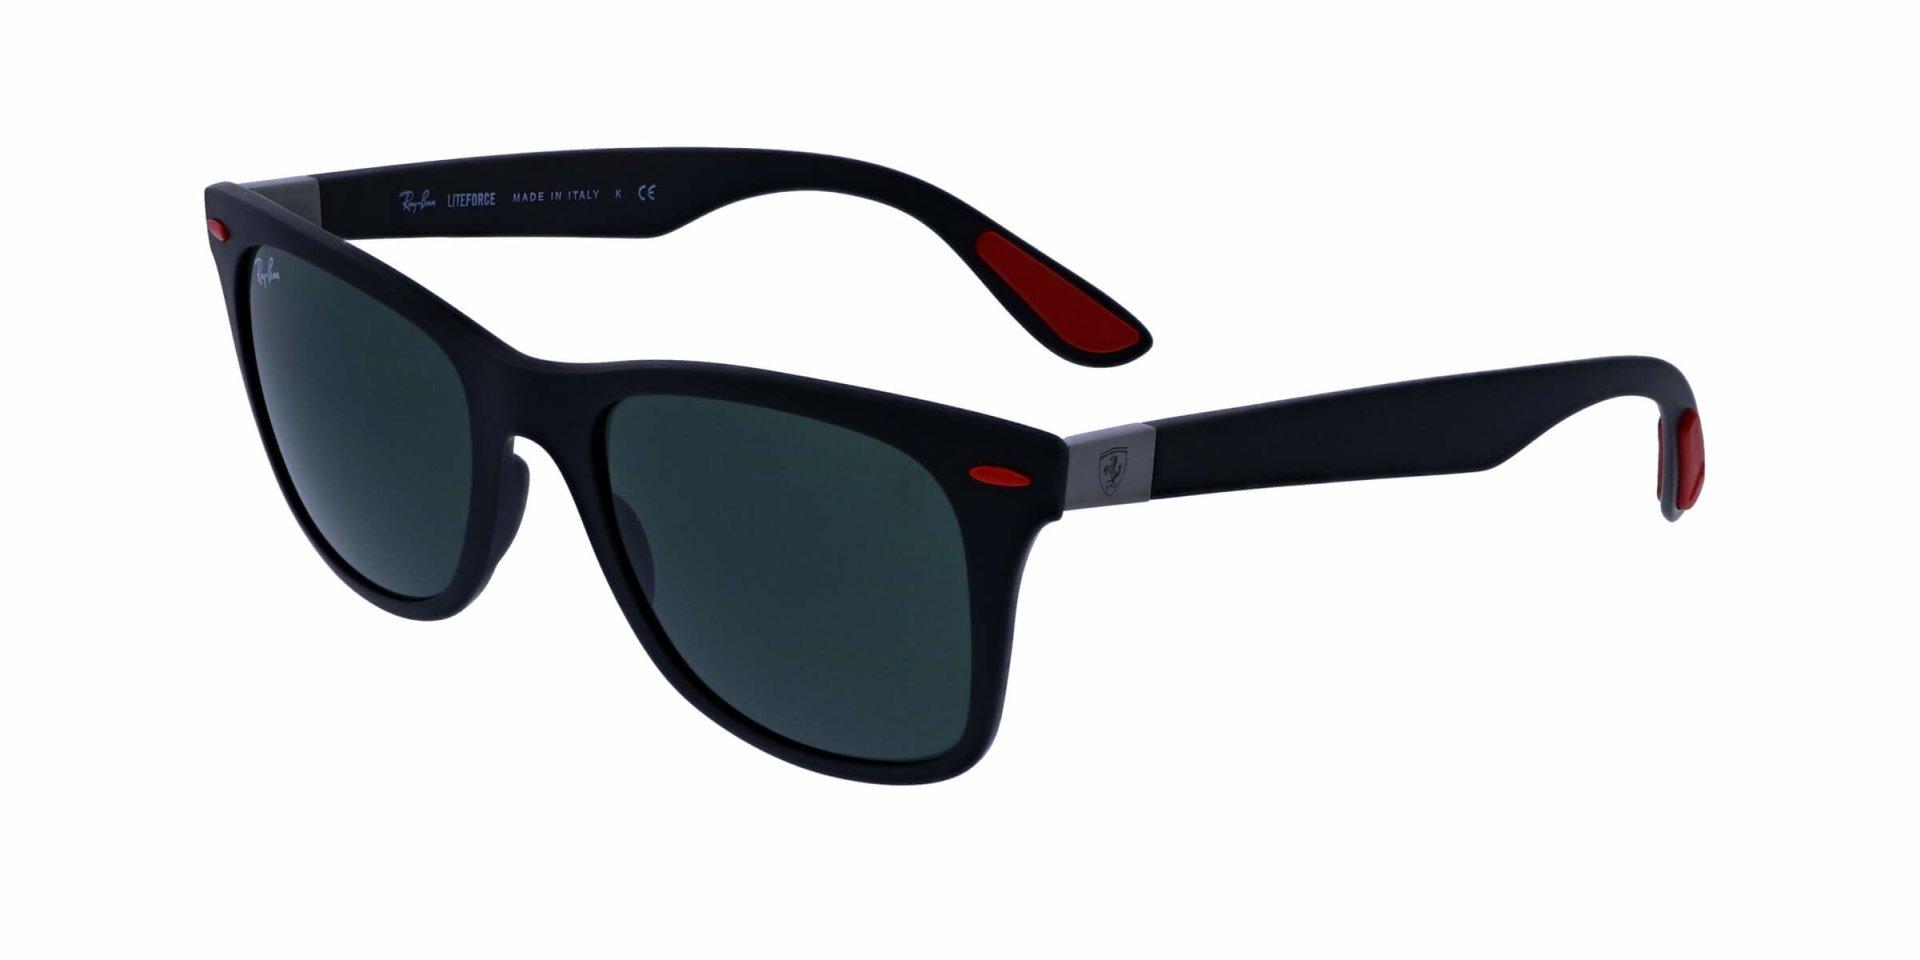 a0fb8dcbc2 Sunglasses RAY BAN